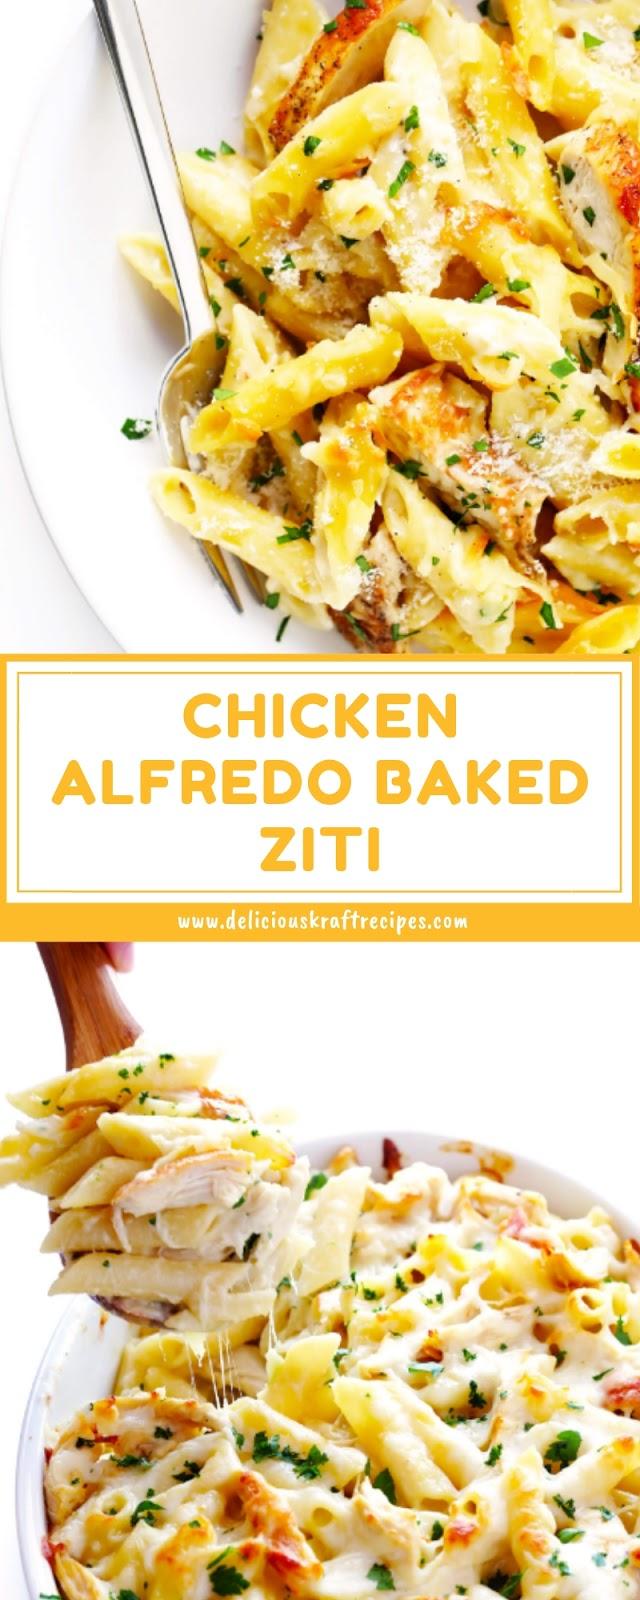 CHICKEN ALFREDO BAKED ZITI